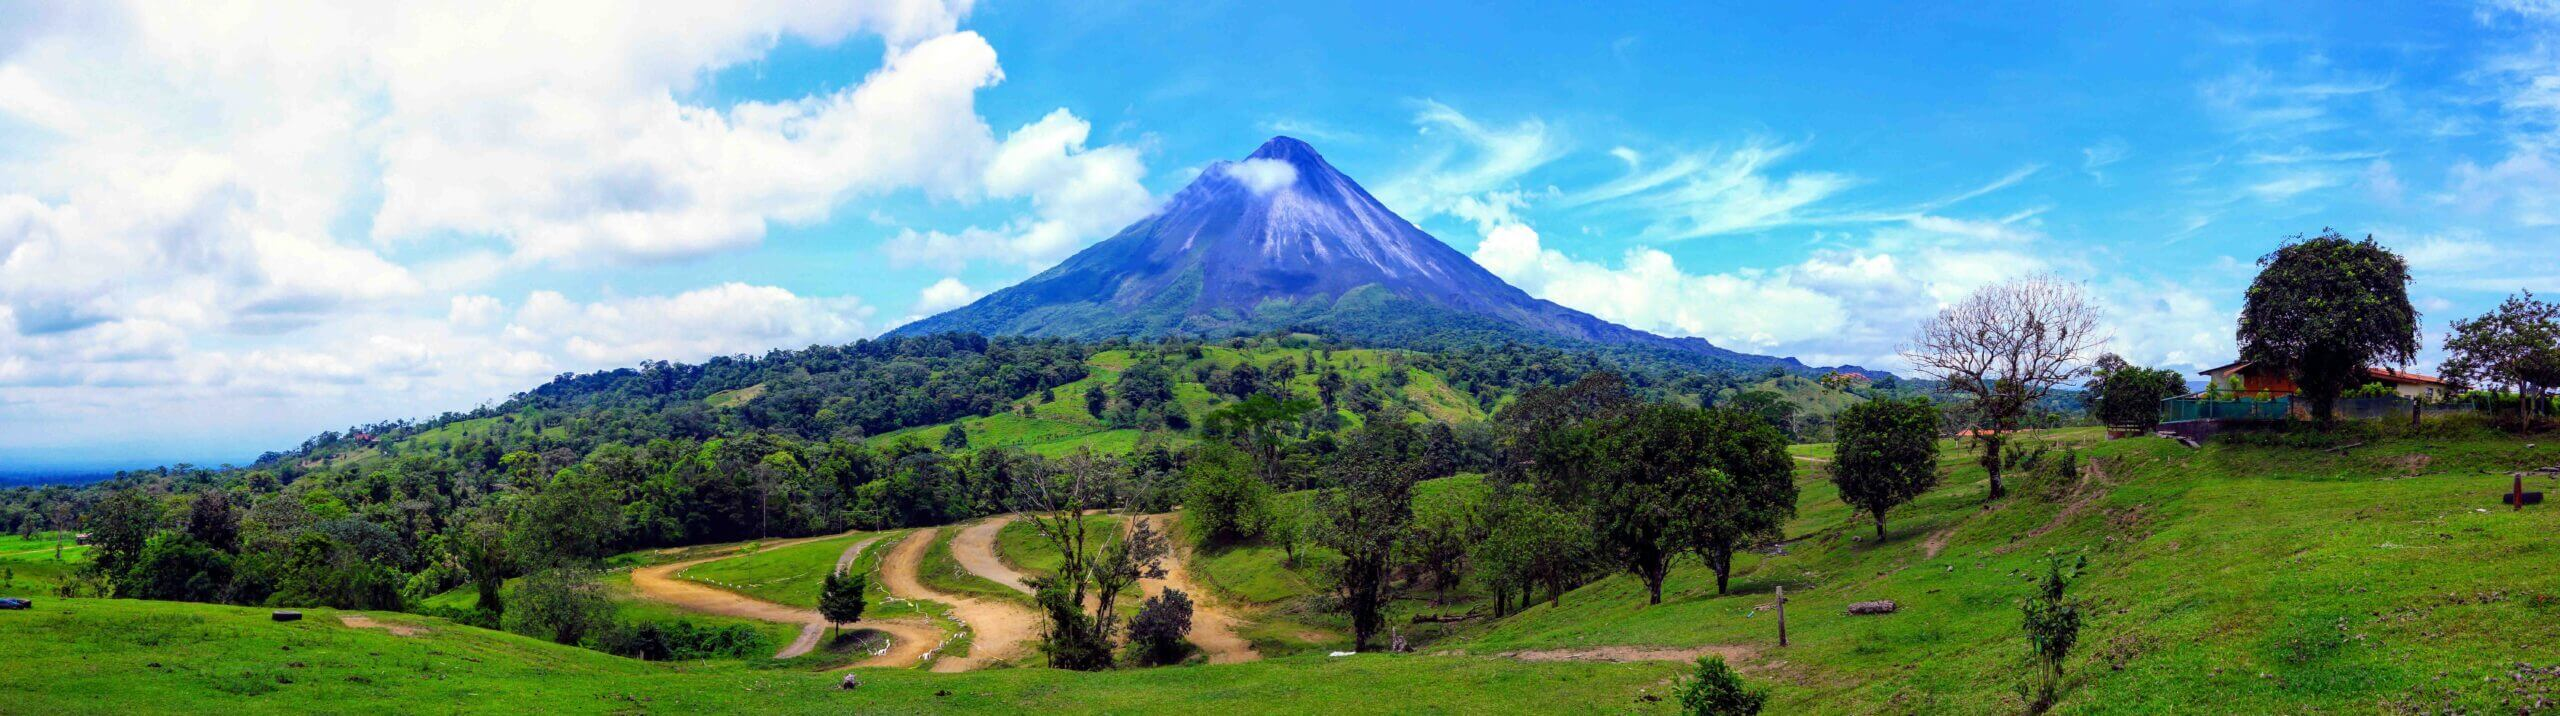 Costa Rica Arenal Vulkaan